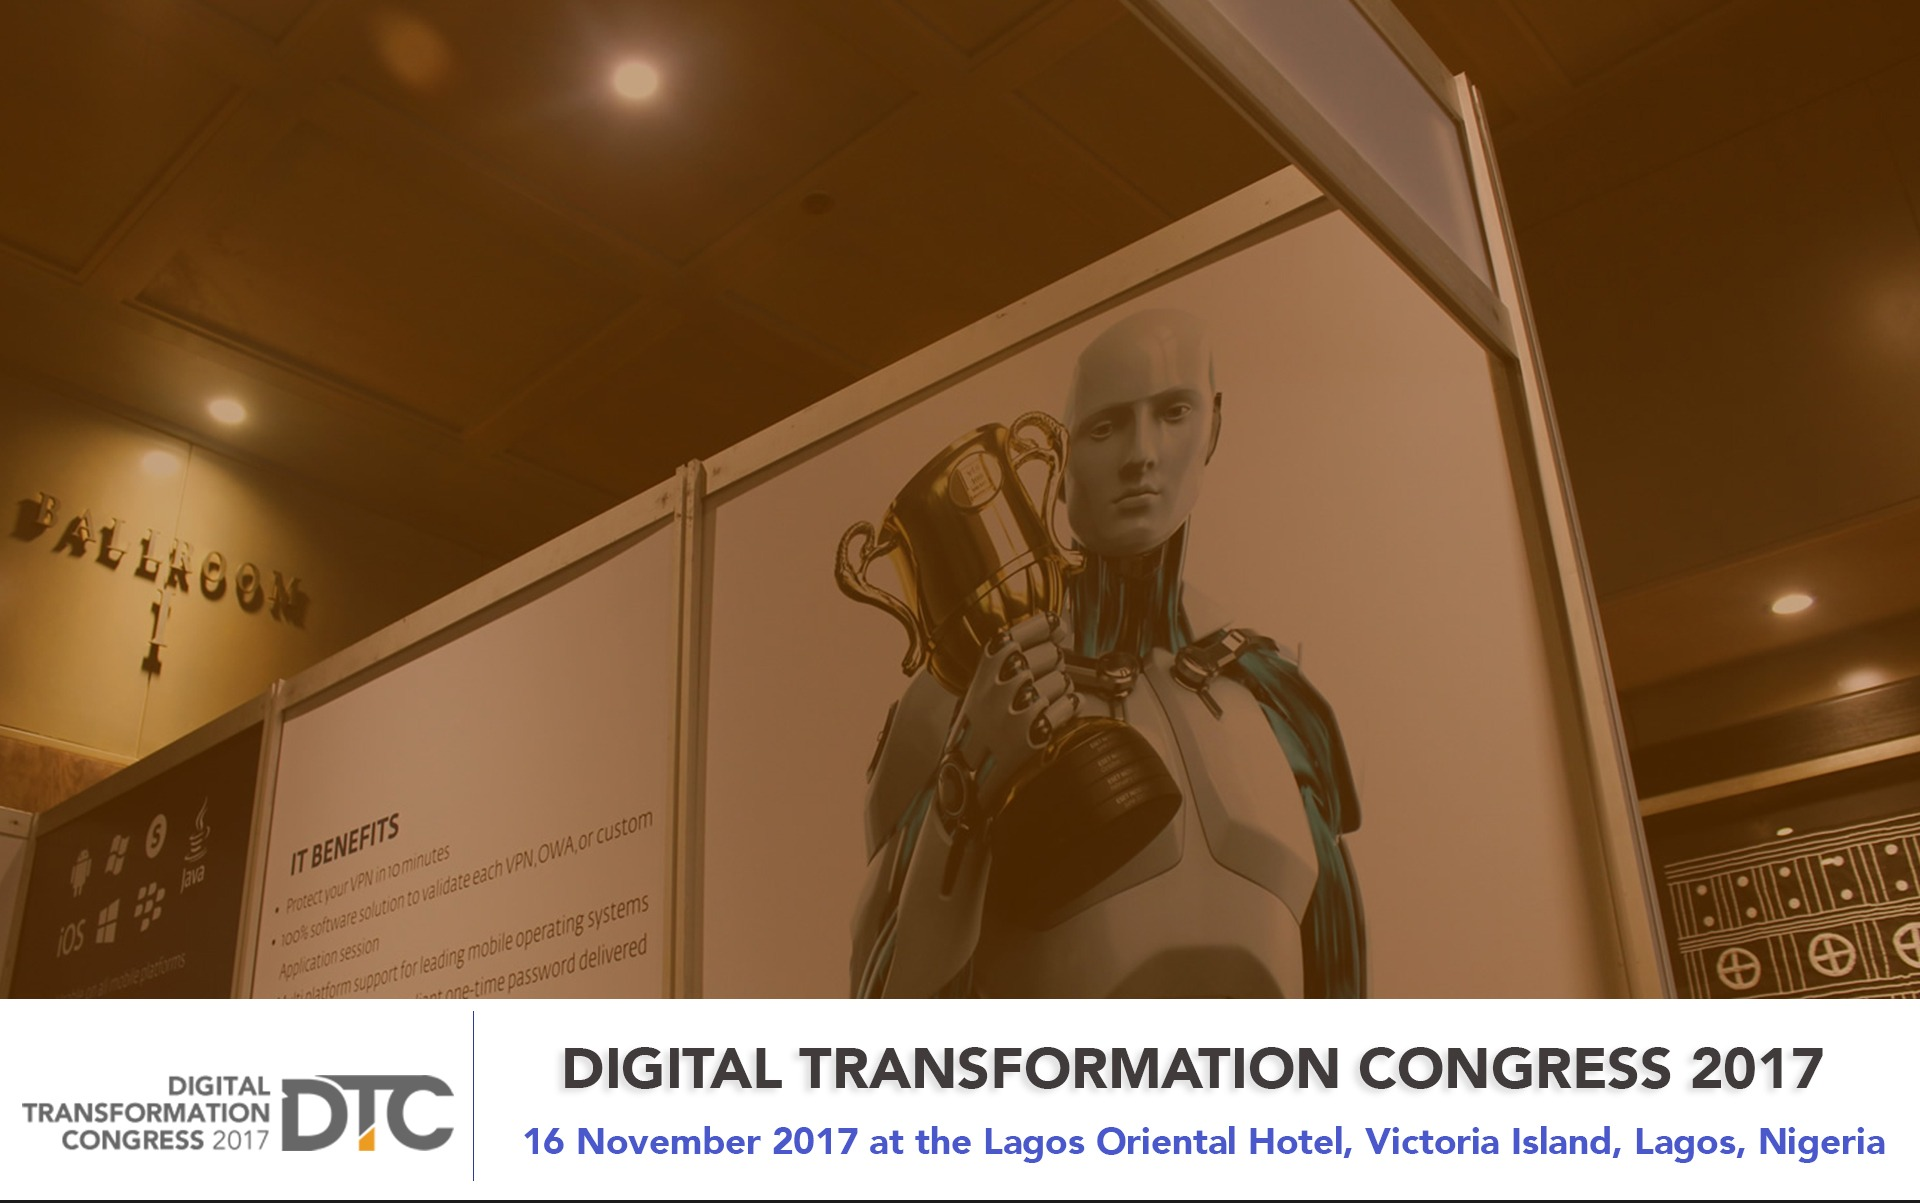 DIGITAL TRANSFORMATION CONGRESS 2017 - Techgistafrica